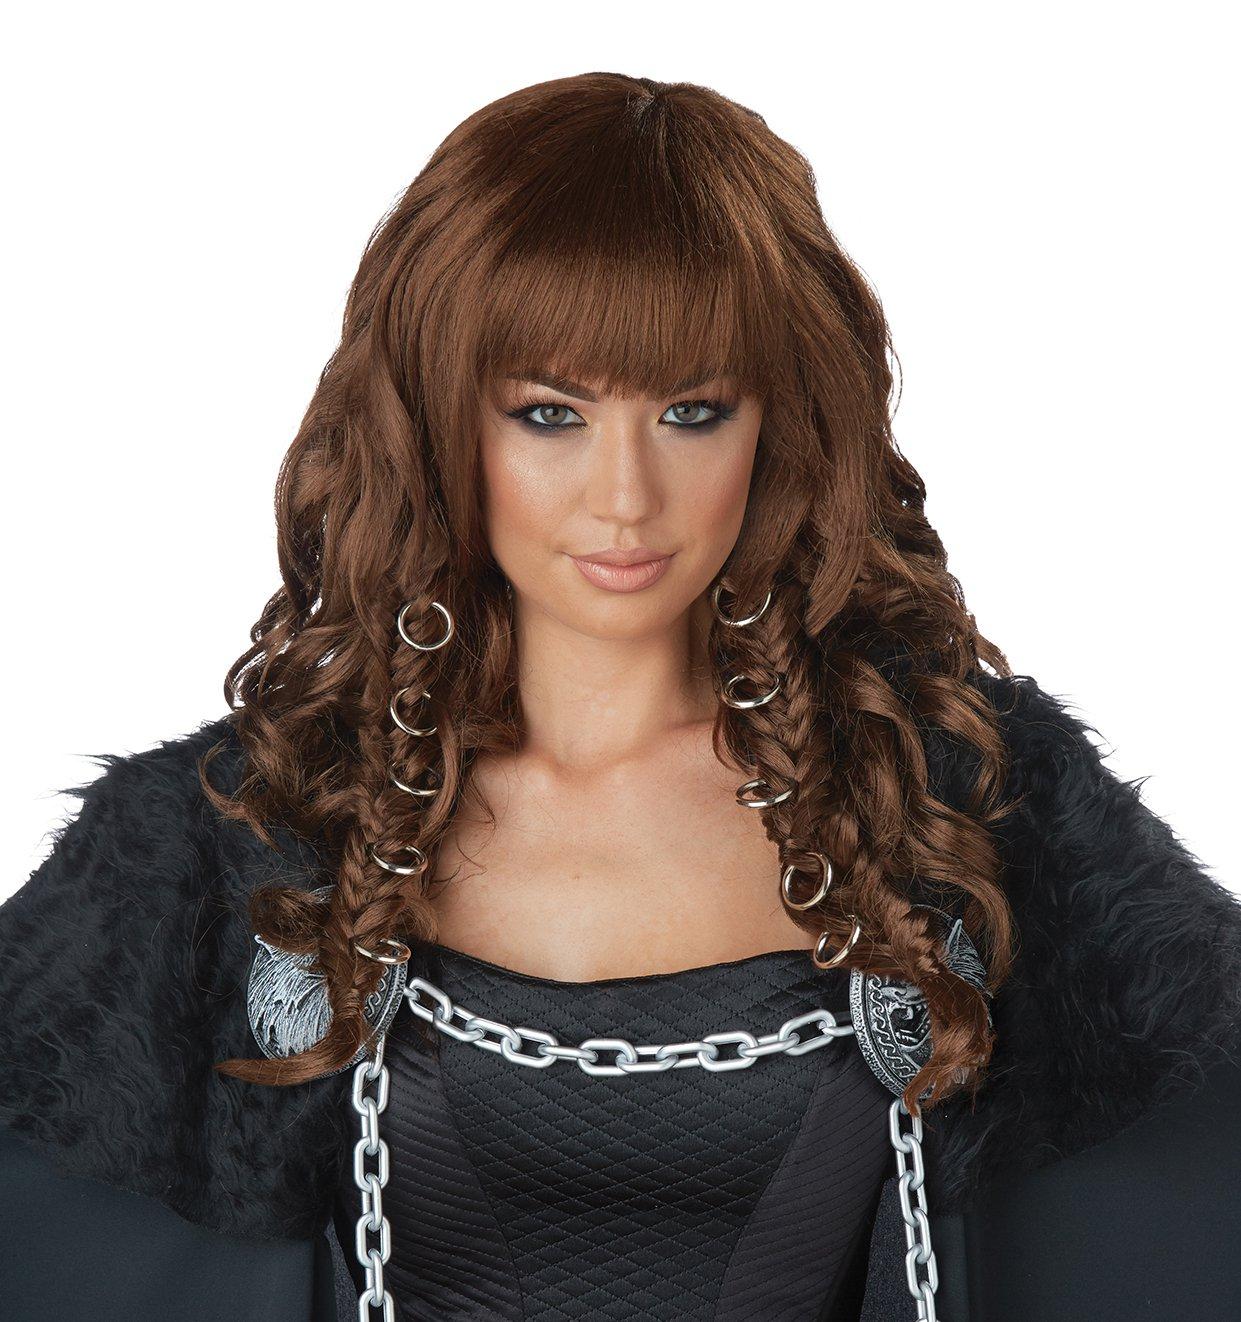 #70894  Renaissance King of Thrones Viking Warrior Queen Costume Accessory Wig